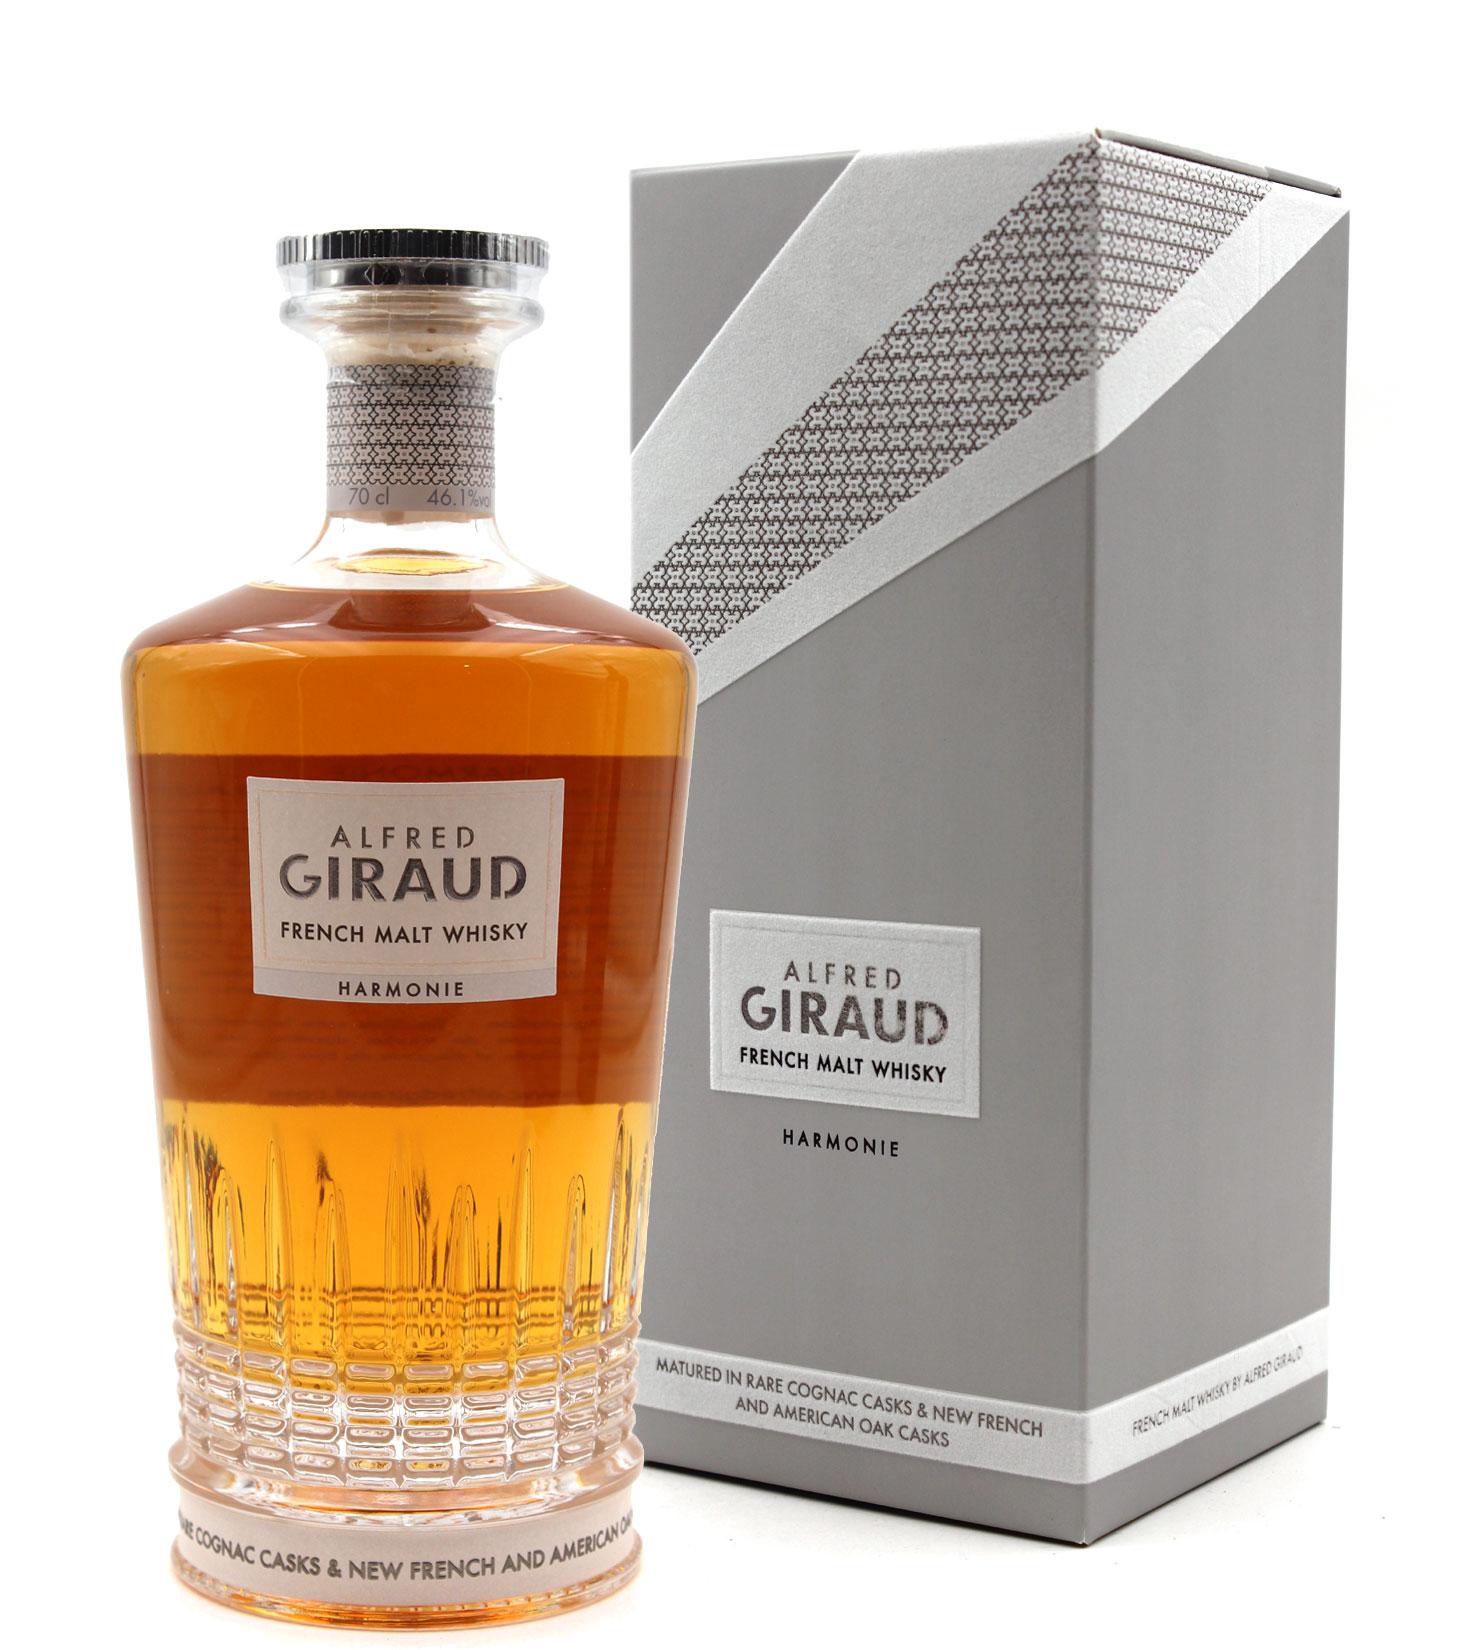 Alfred Giraud Harmonie Whisky 46.1% - 70cl